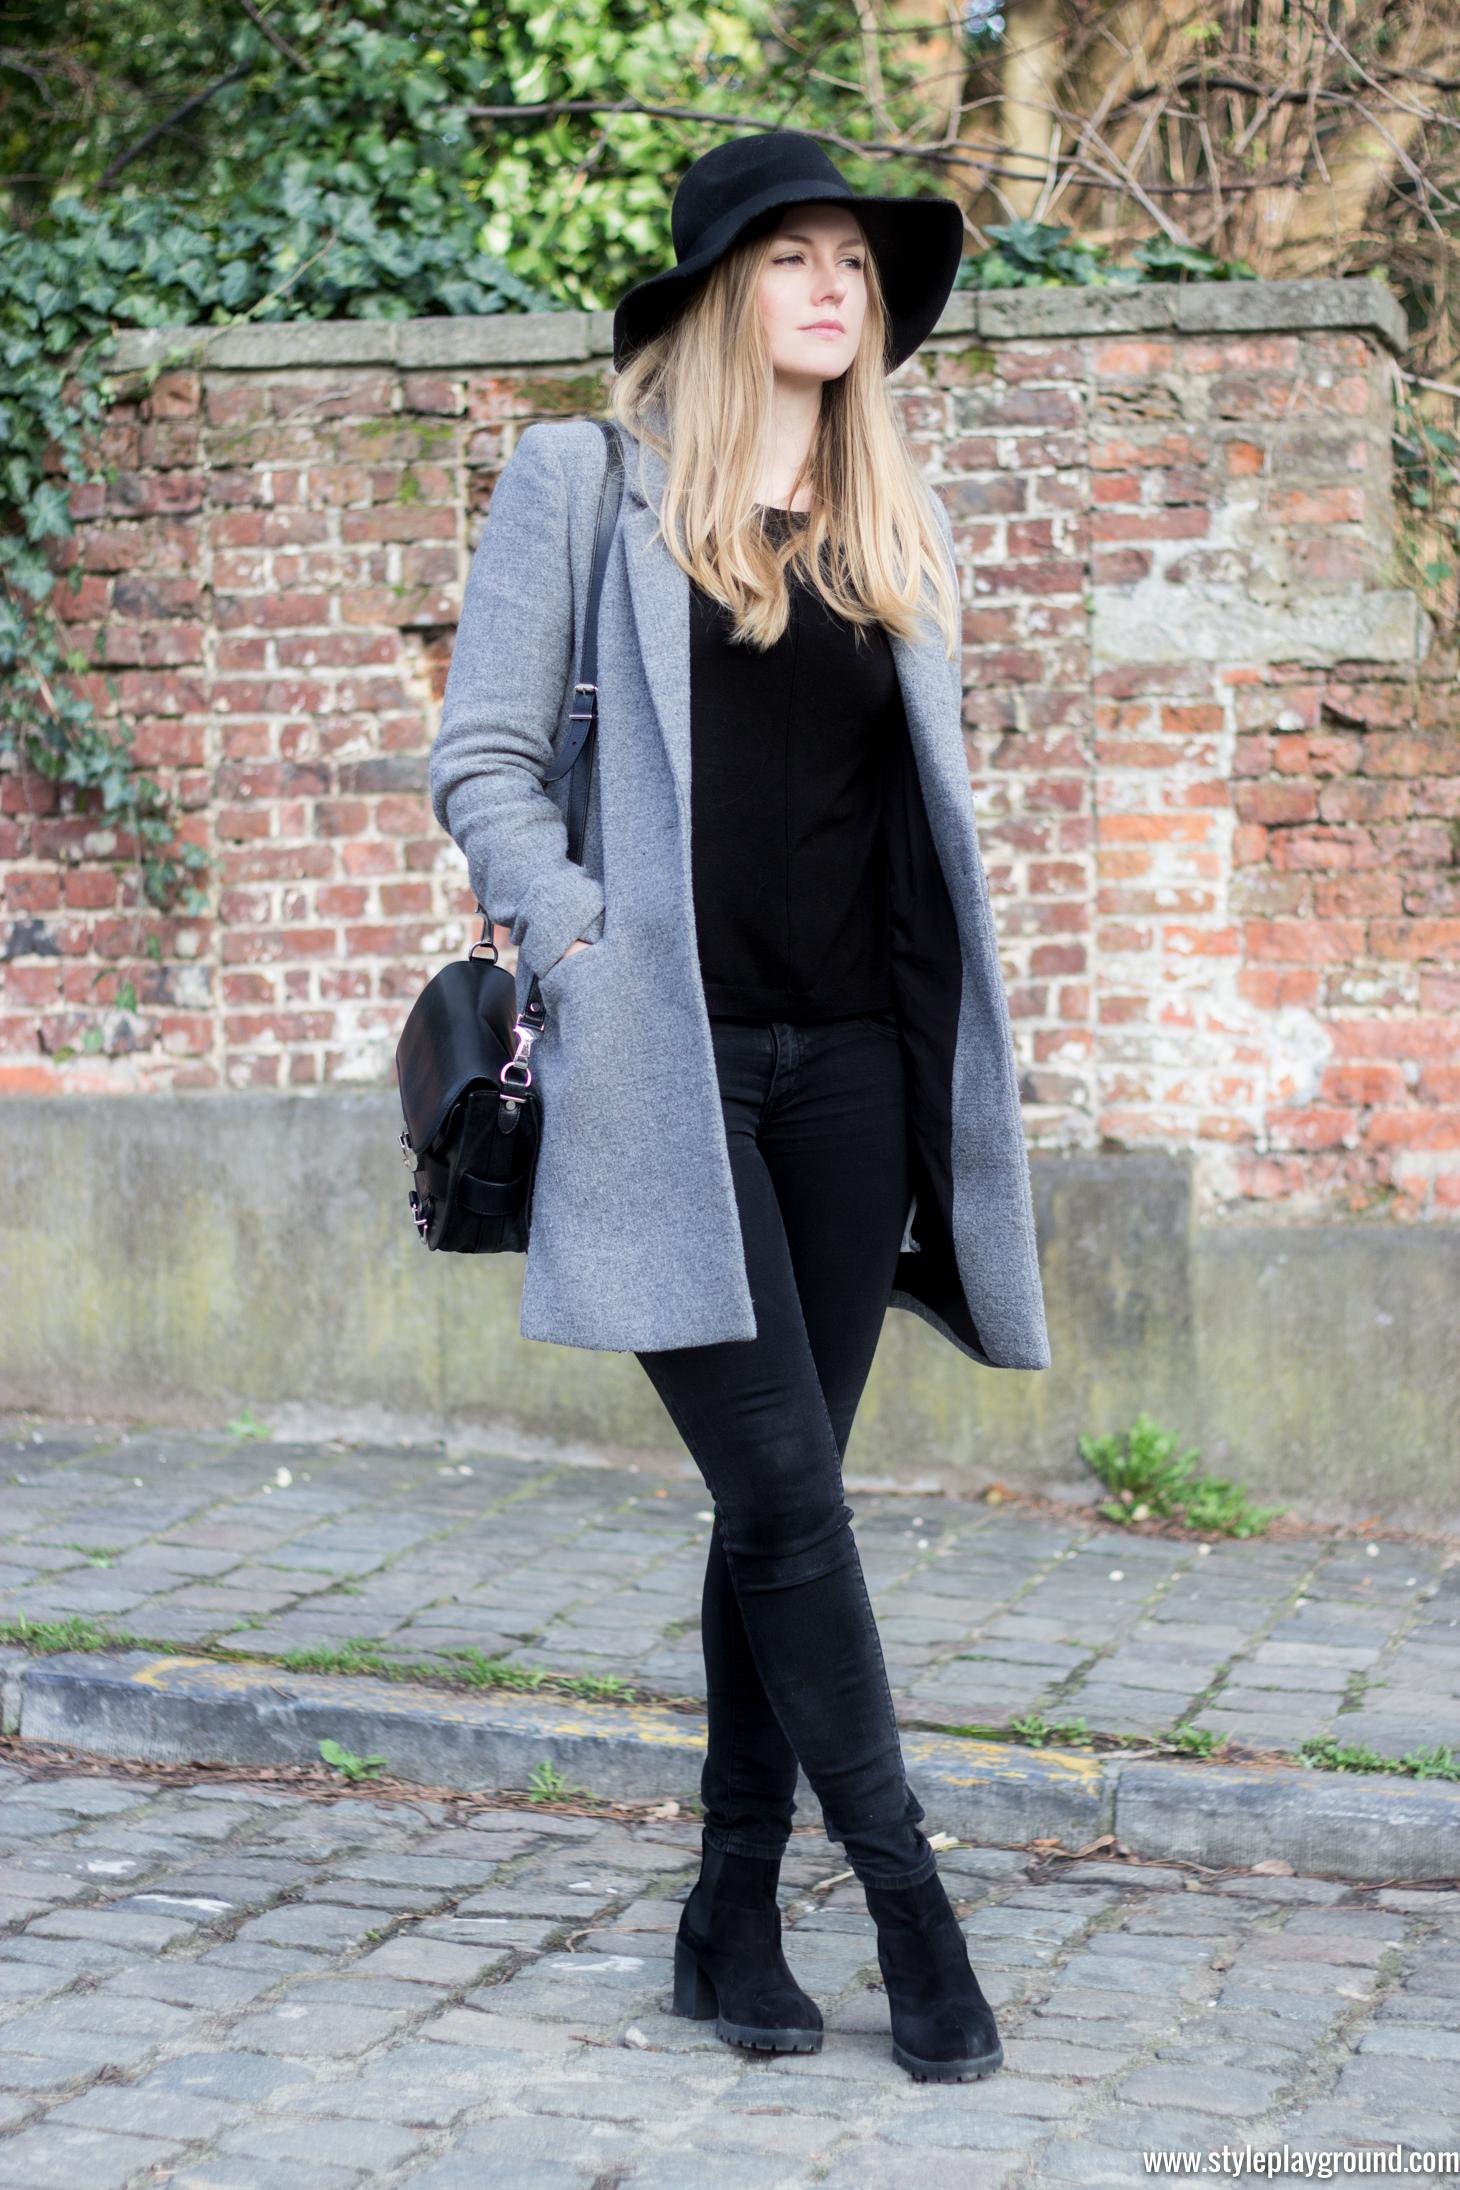 Zara coat, New Look jumper, J Brand skinny jeans, Asos booties, H&M hat, Proenza Schouler PS11 bag via www.styleplayground.com